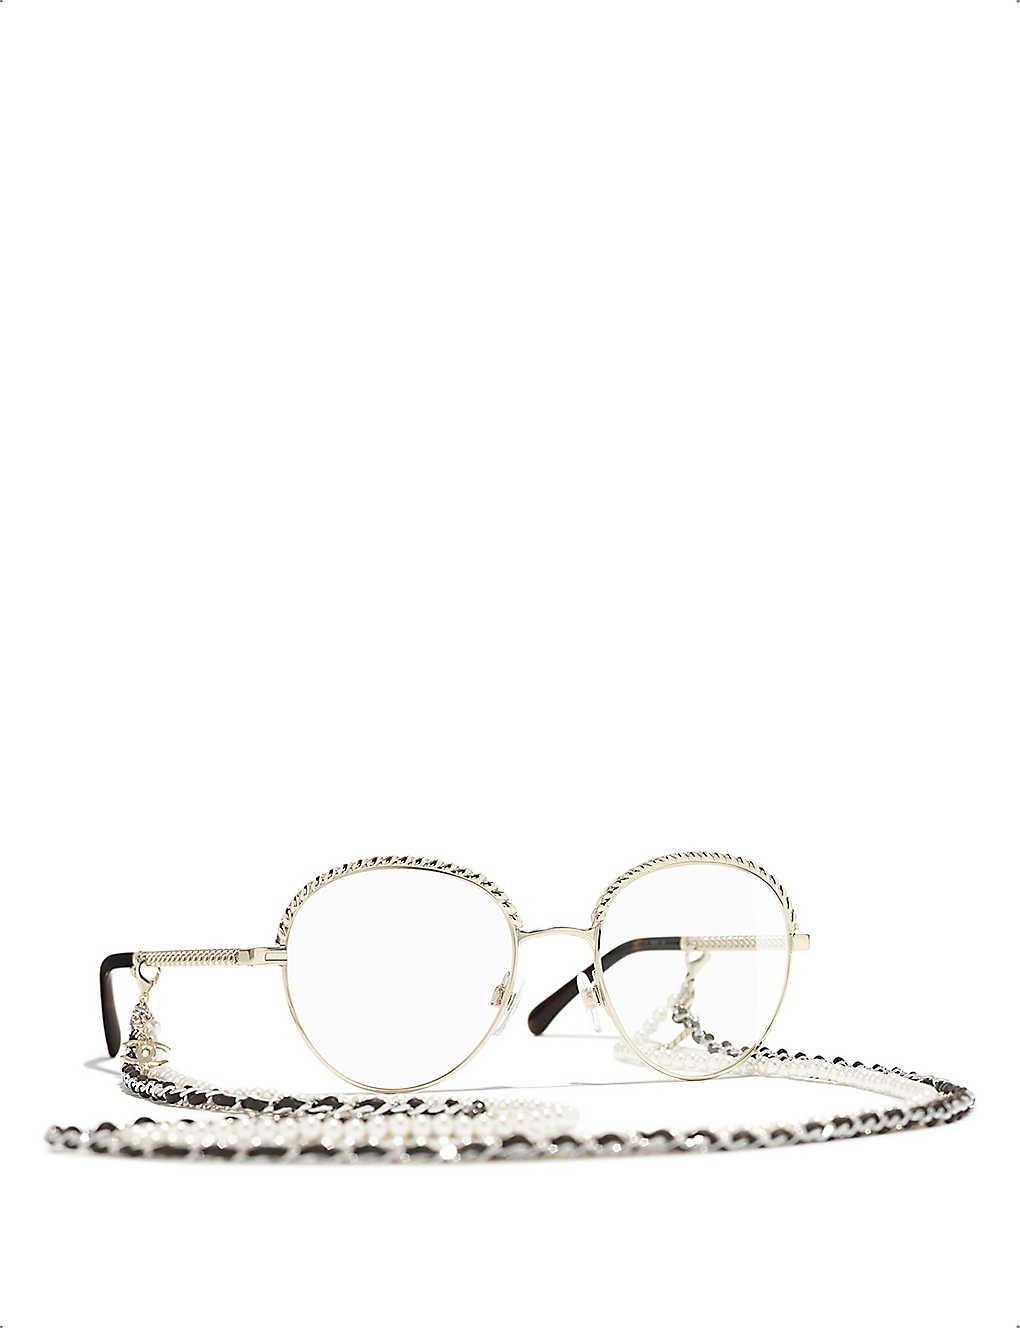 CHANEL: Pantos gold-toned metal glasses